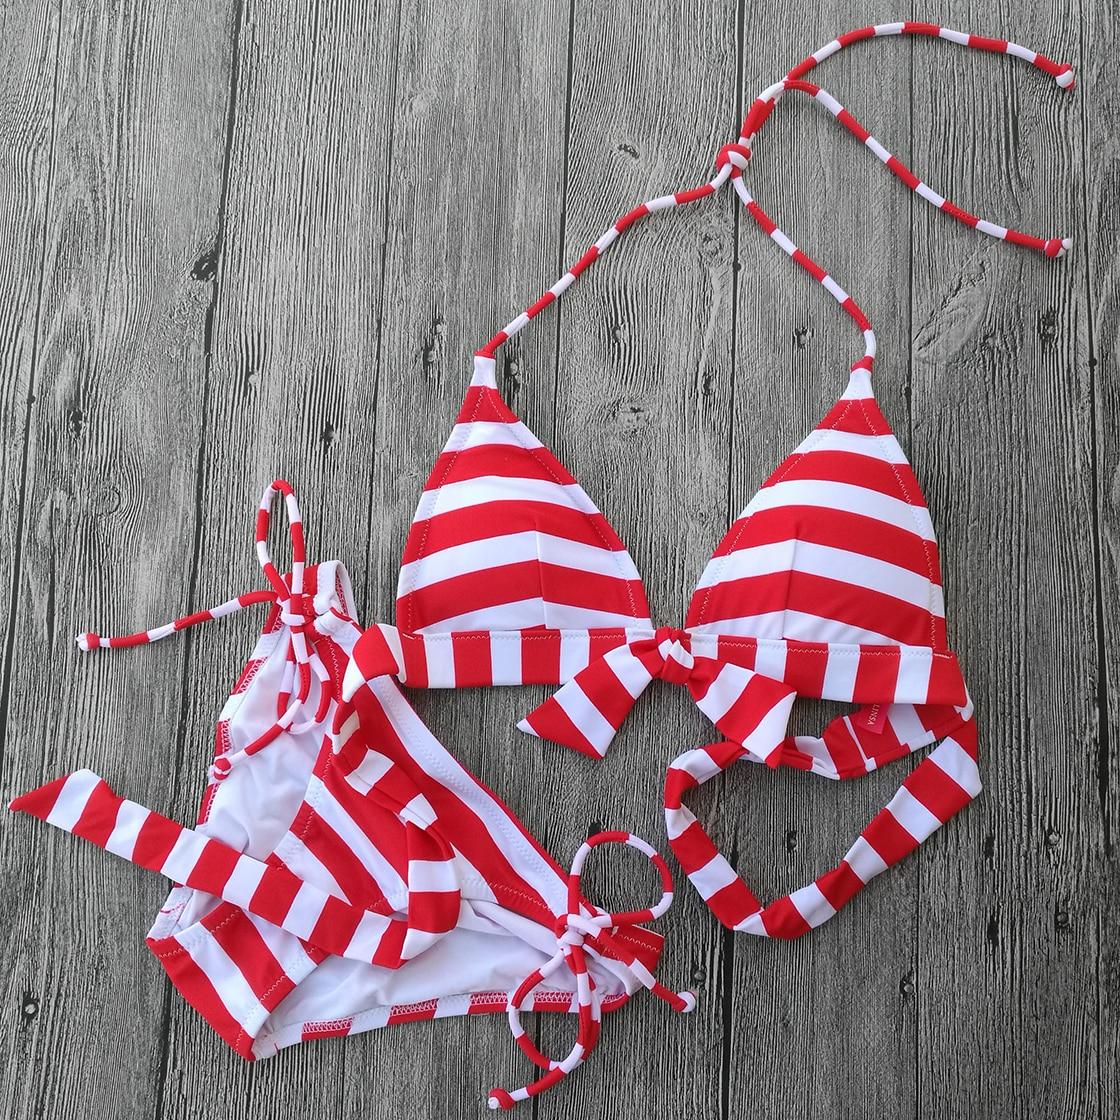 Red Striped Triangle Bikini Swimwear Women 2017 Sexy Thick Swimsuit Swimming Suit Design Secret Bathing Suit Bikinis<br><br>Aliexpress